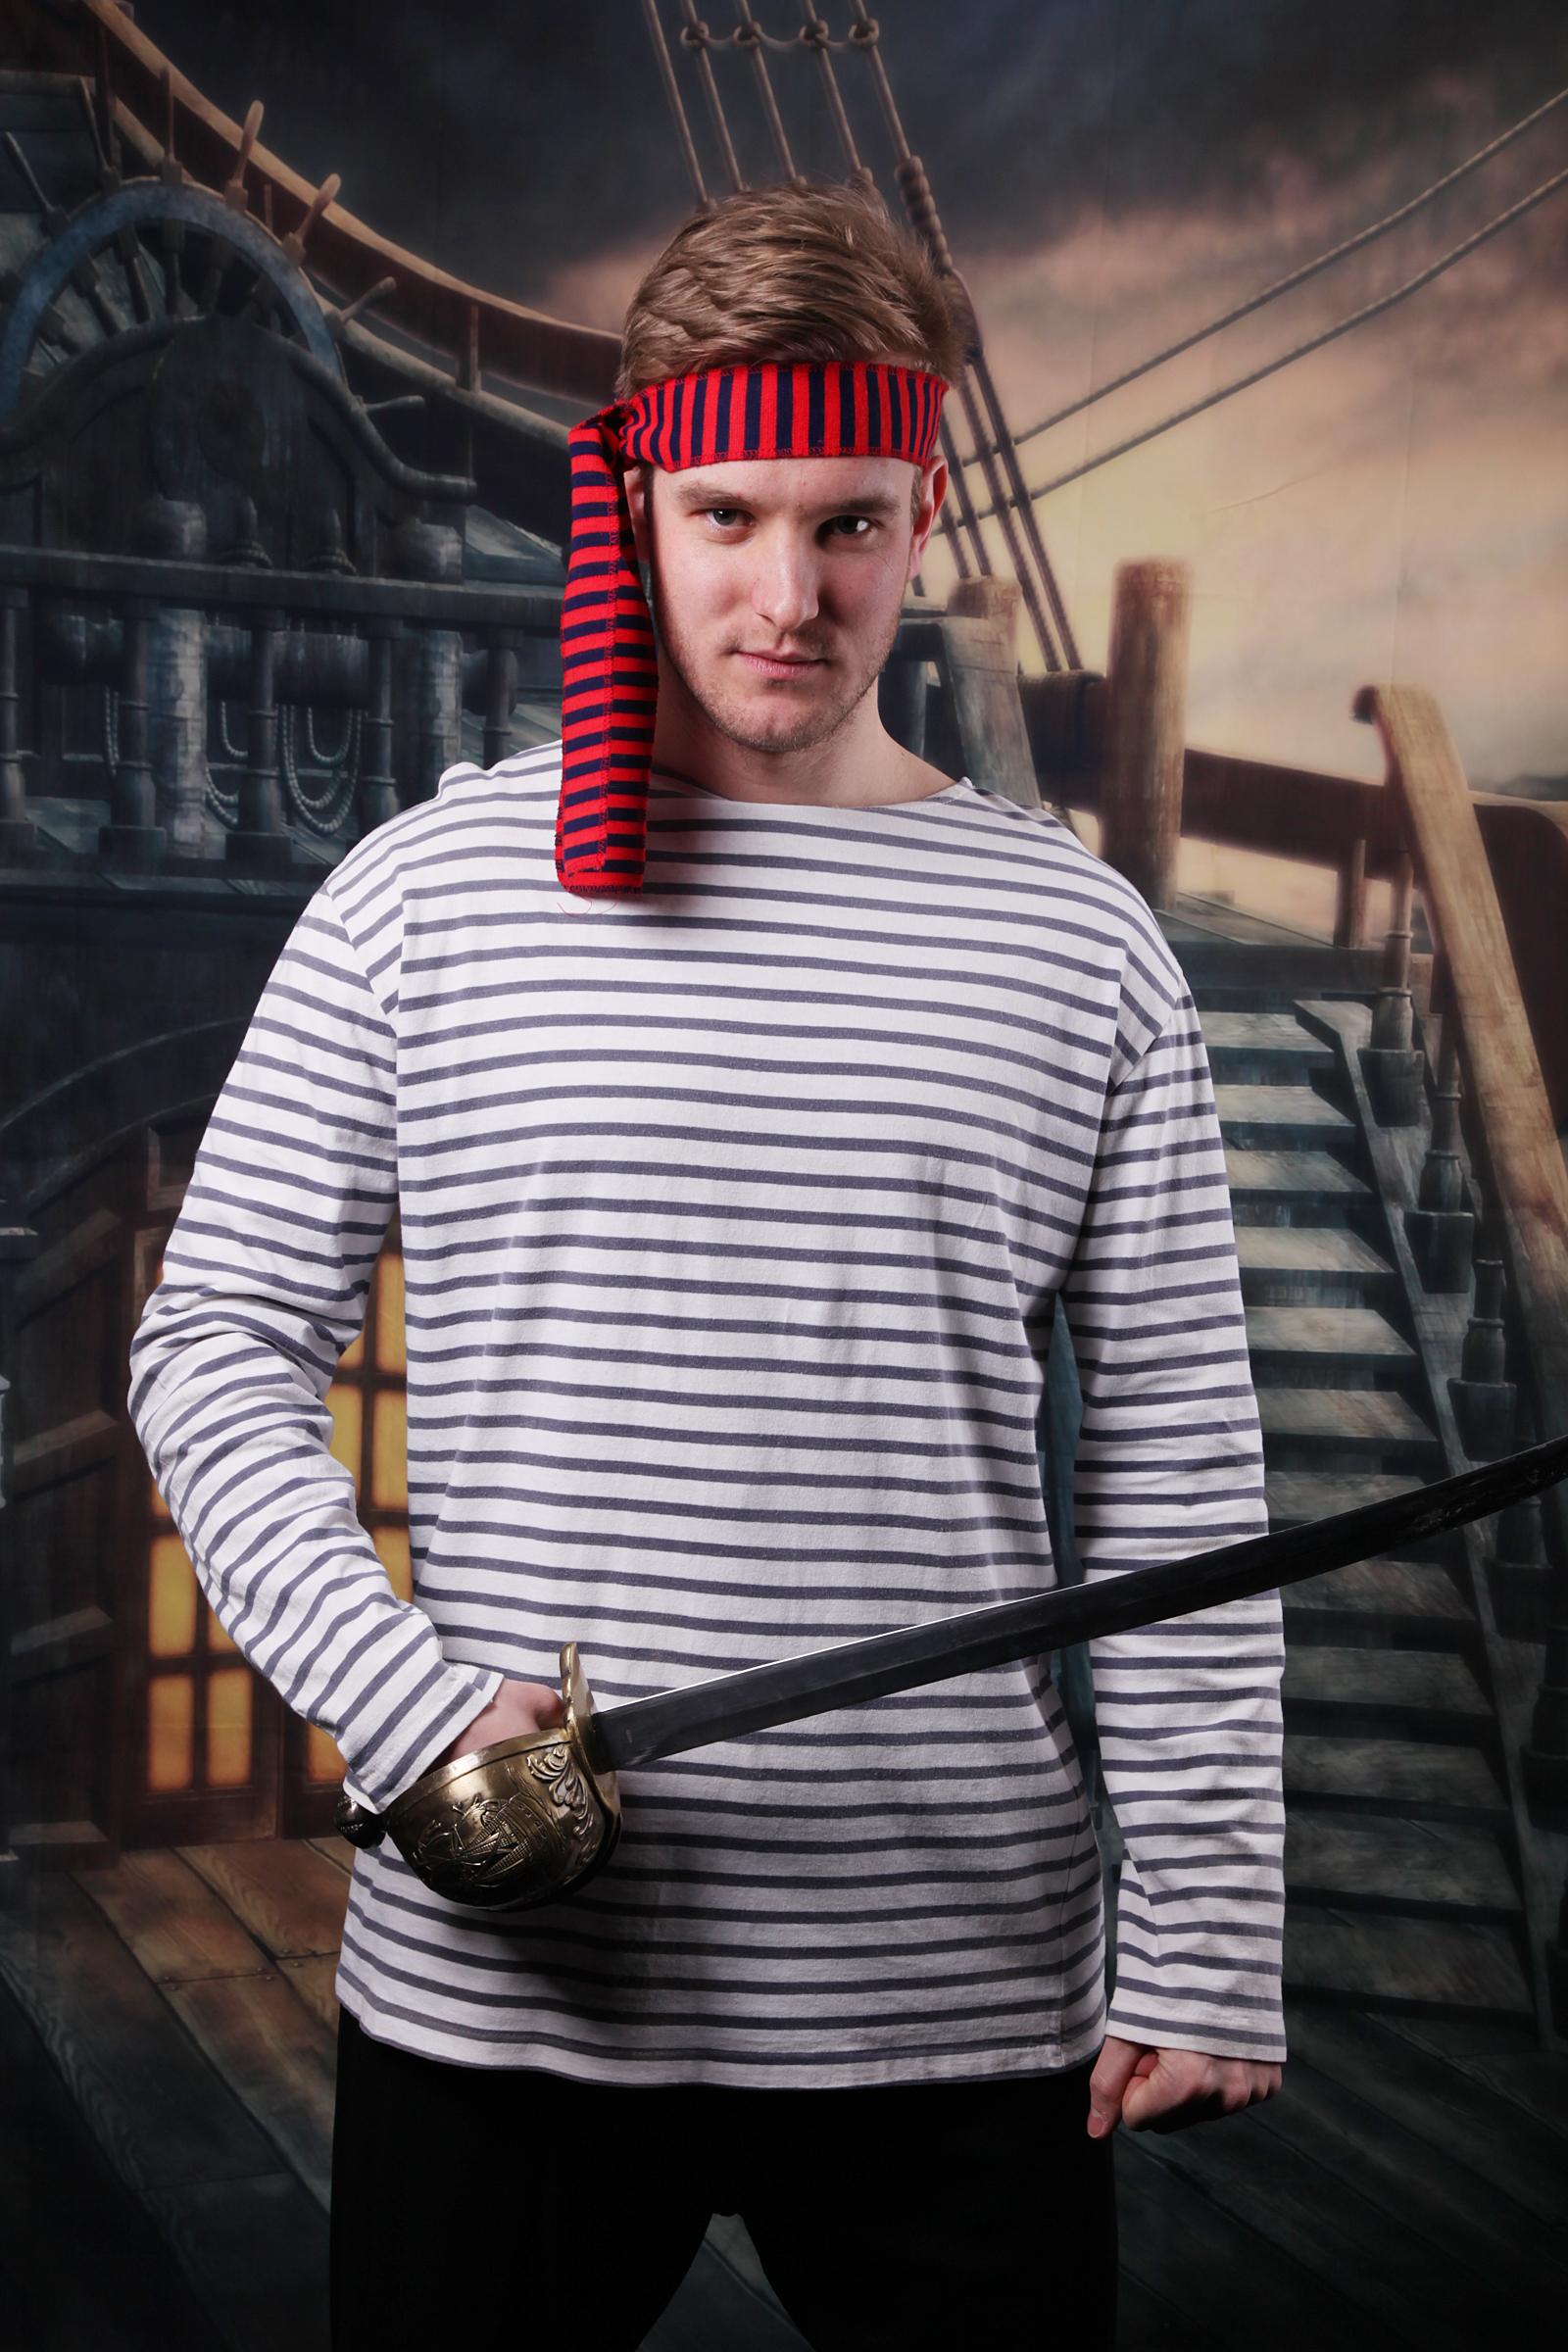 Pirate_Smee_costume